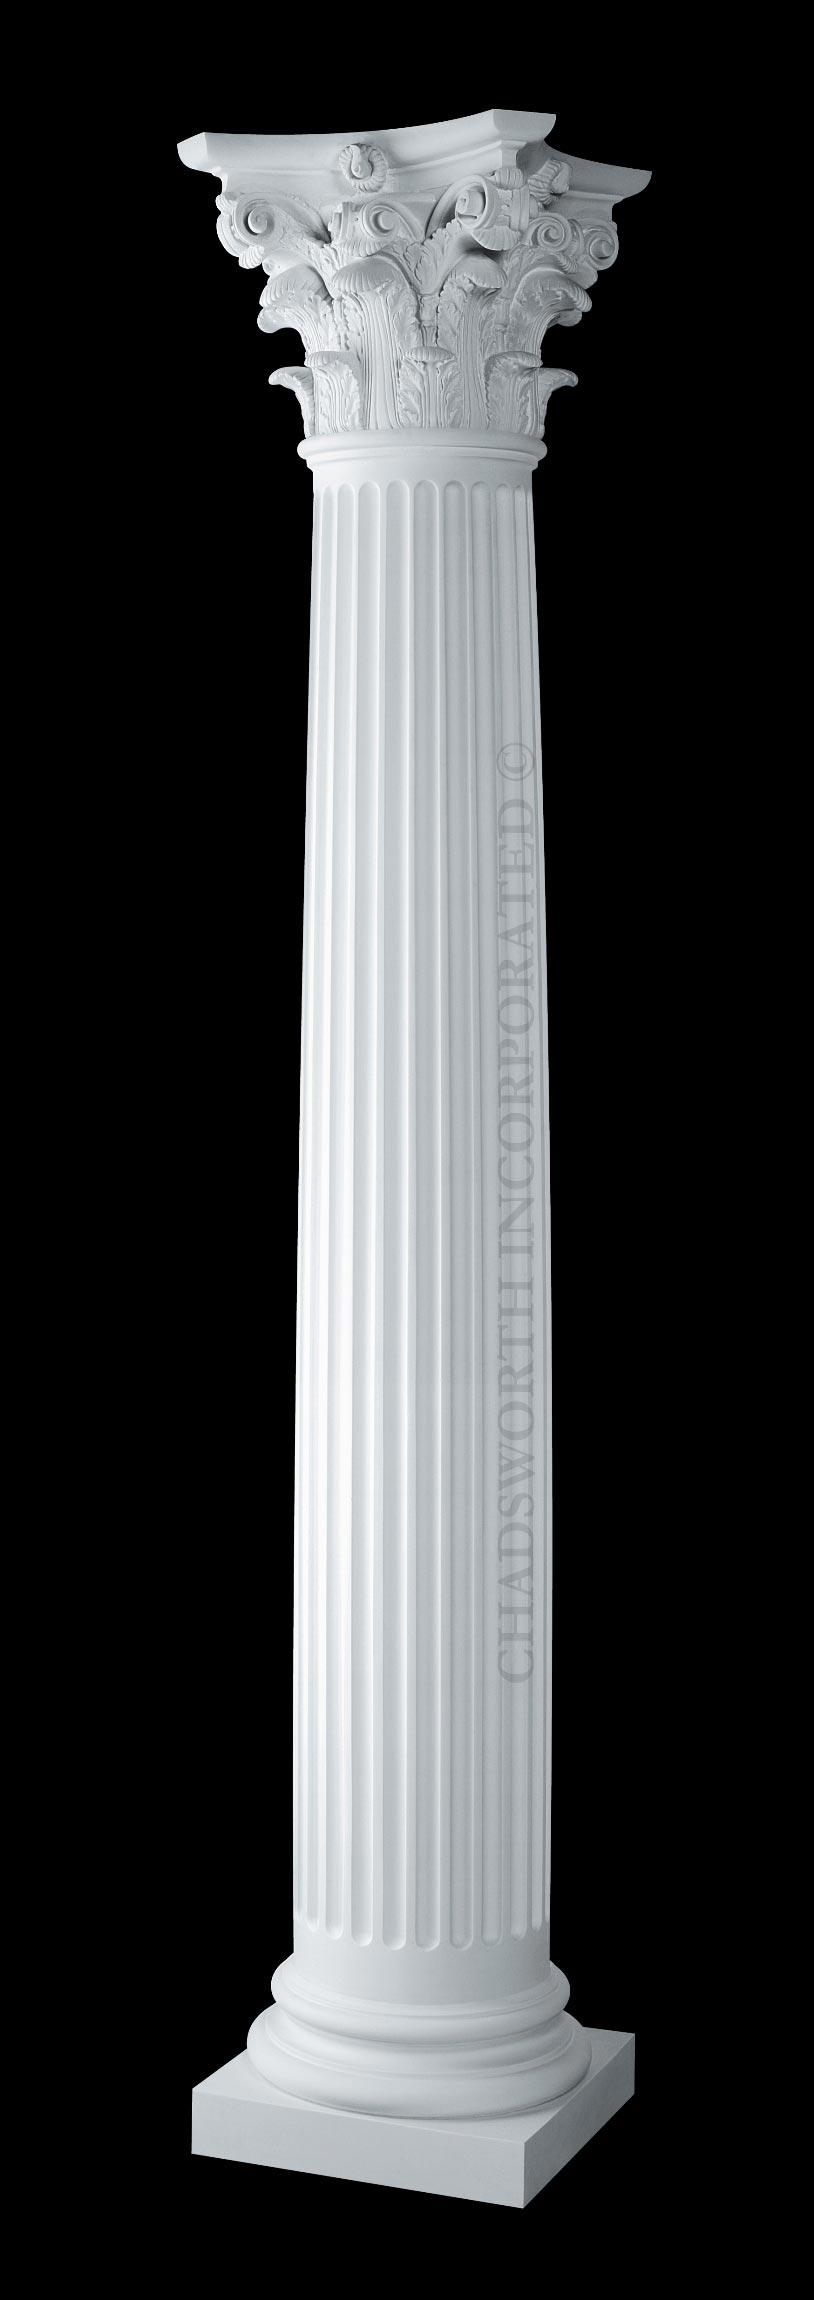 Classic Stone Columns Fluted Round Roman Corinthian